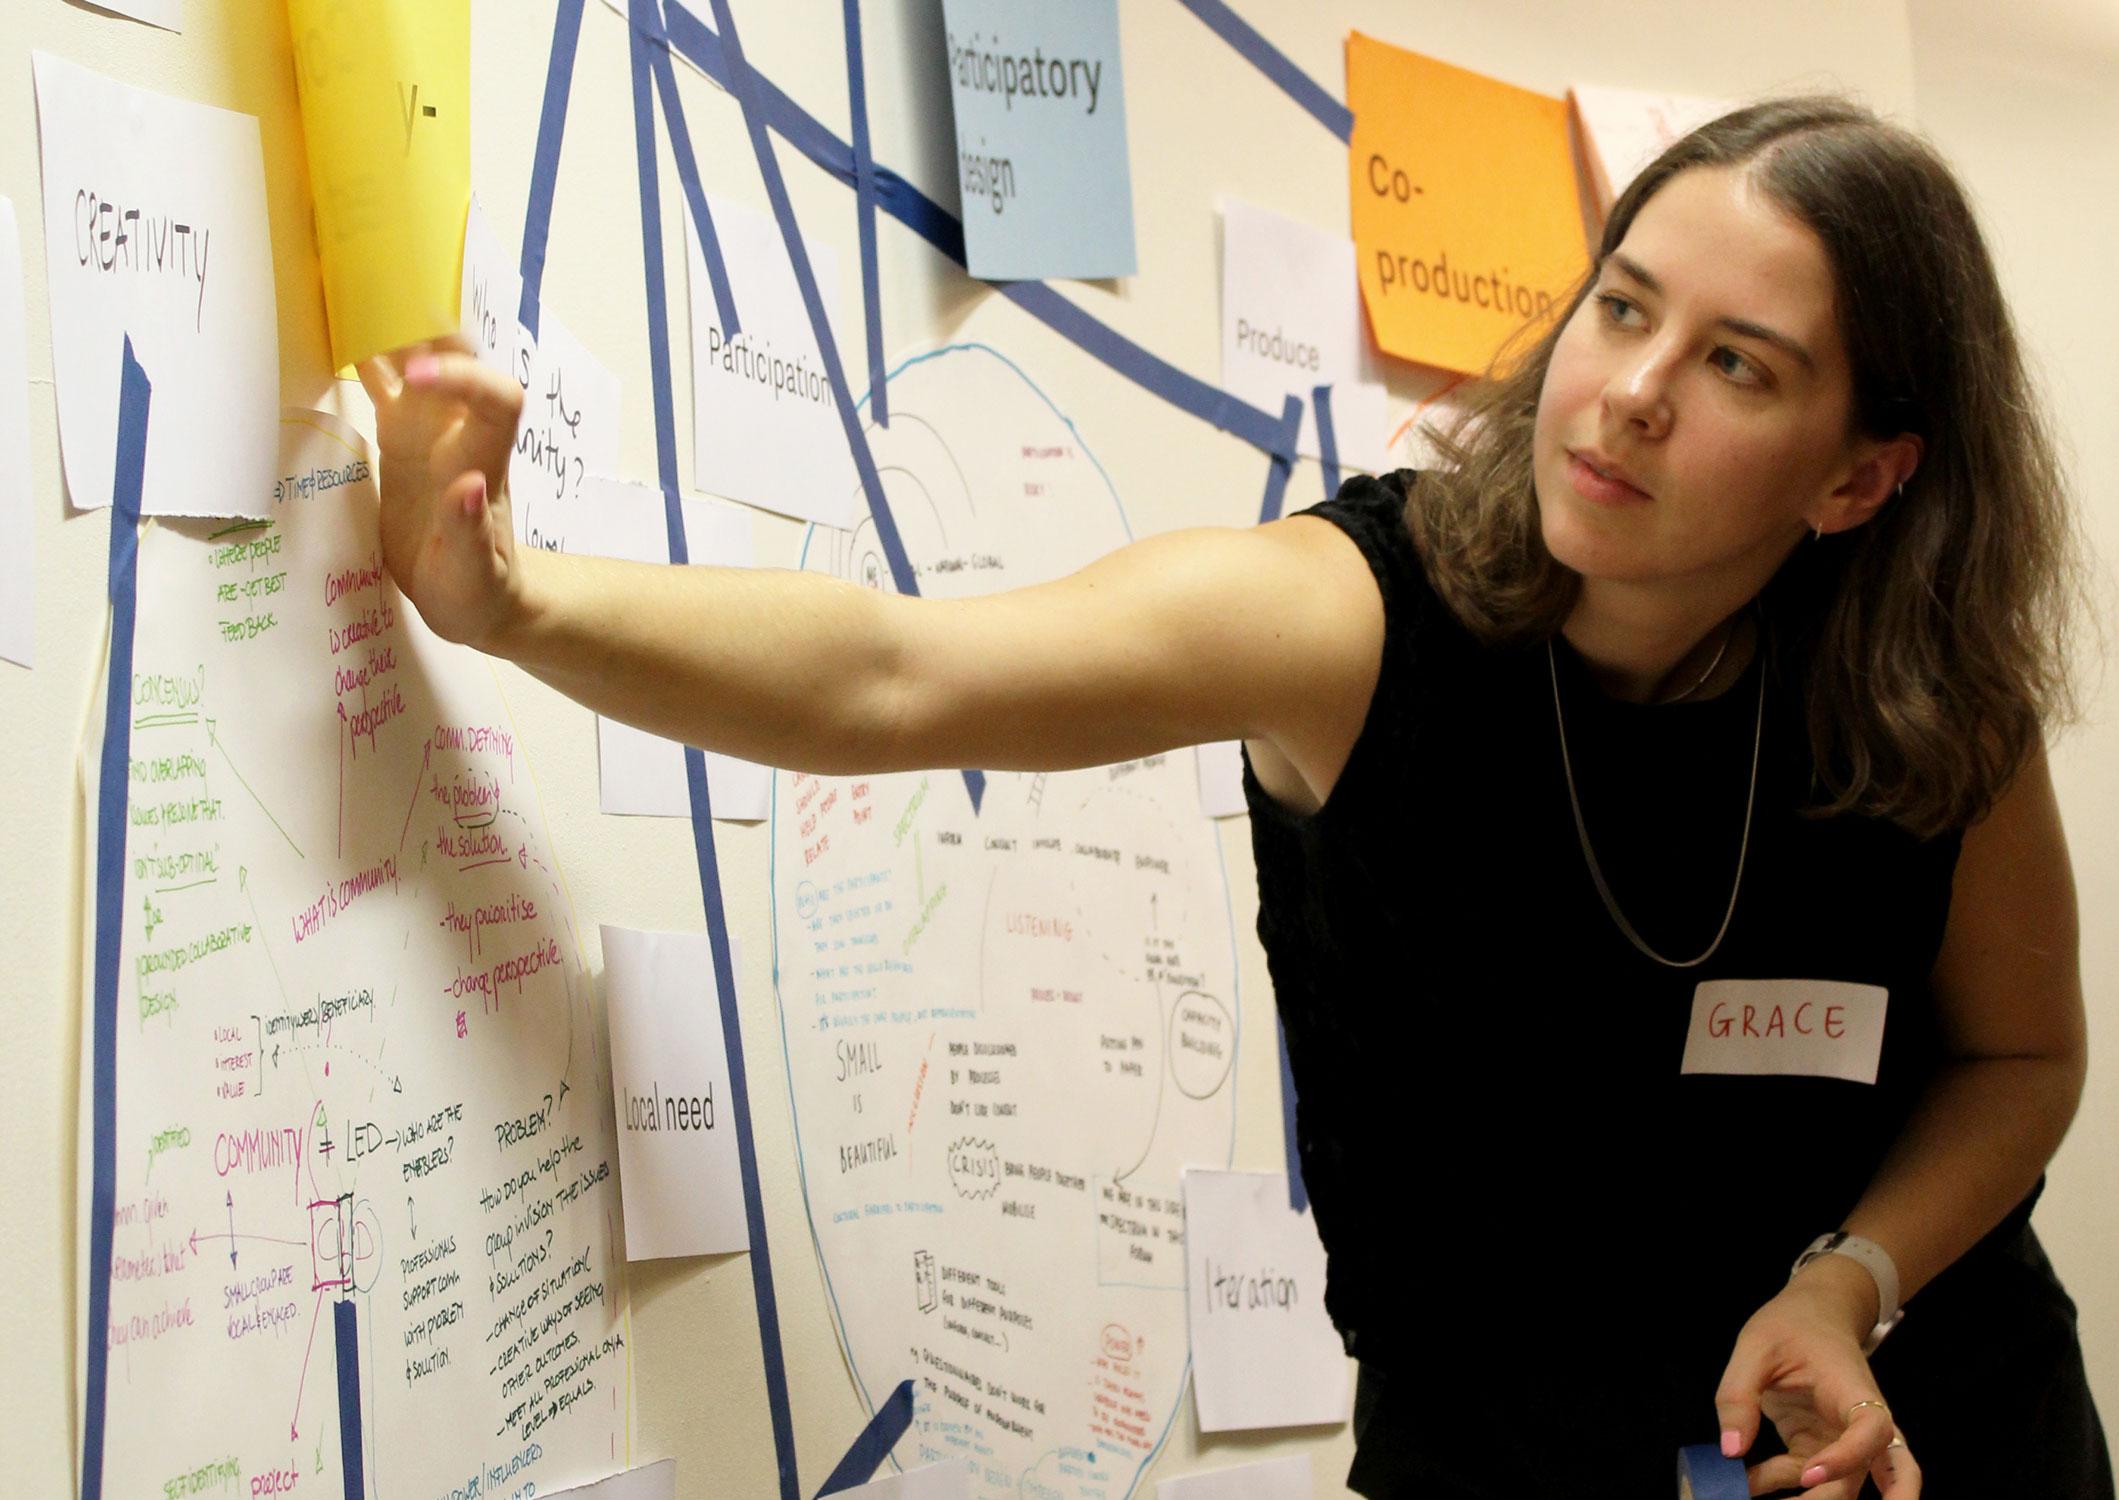 Beyond Buzzwords: The Language of Collaborative Design